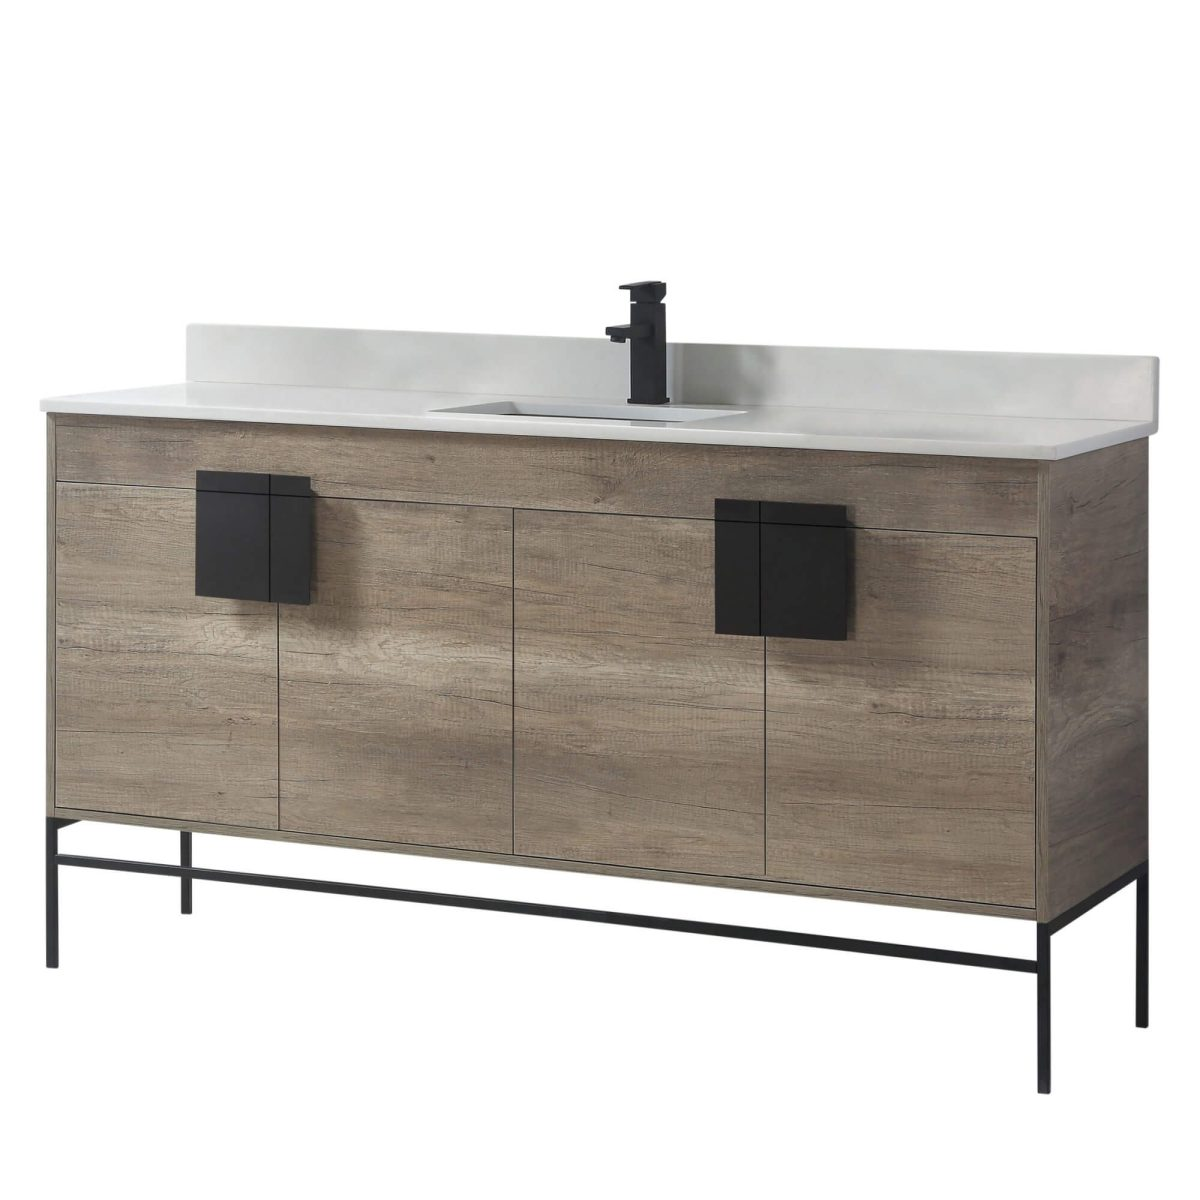 "Shawbridge 60"" Modern Single Bathroom Vanity  Shadow Gray with Black Hardware"